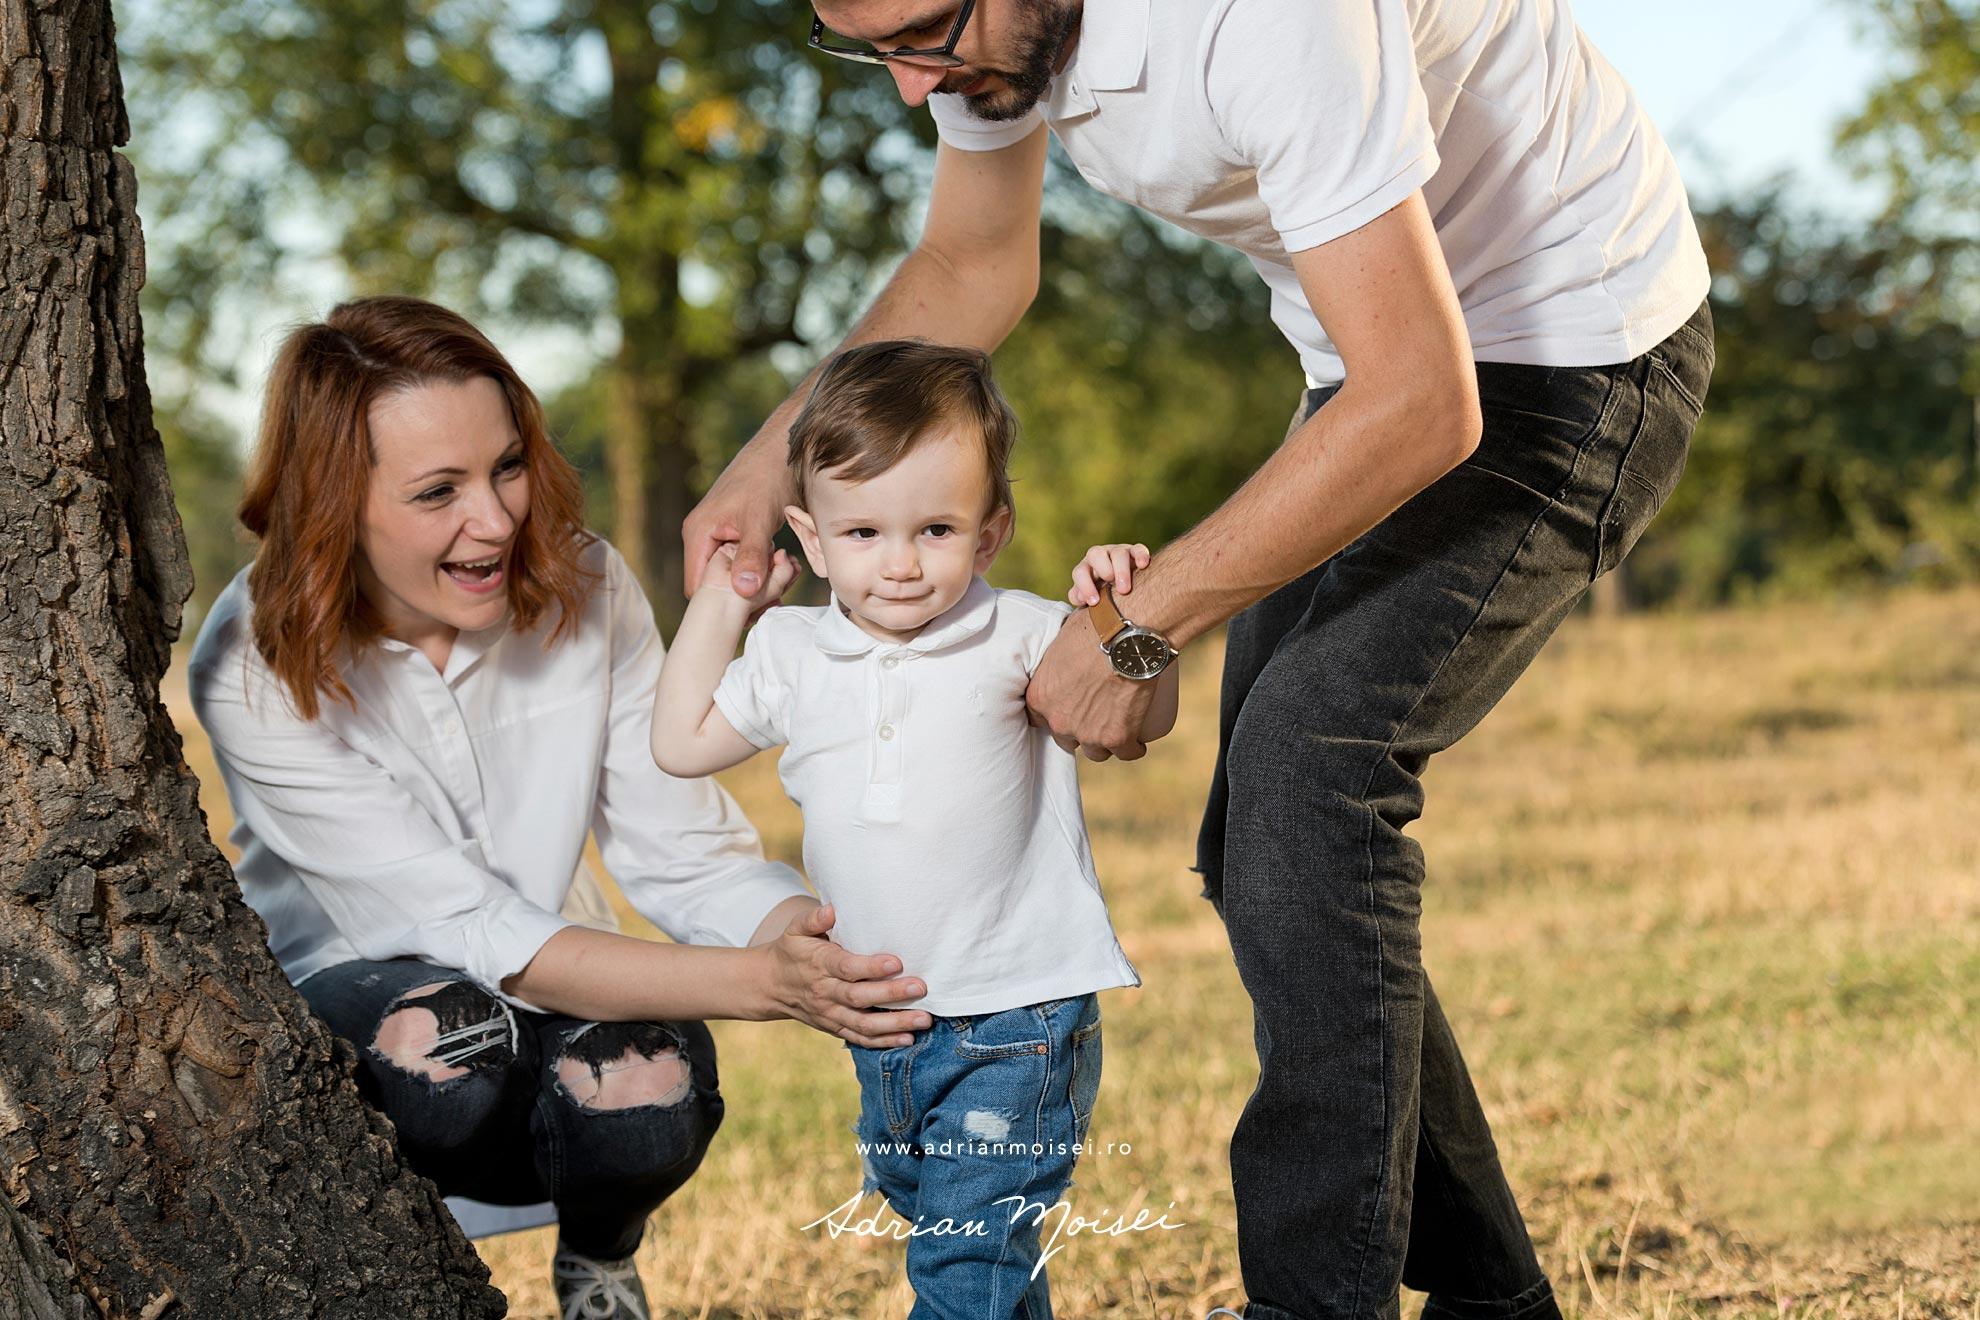 Pastrati in cele mai frumoase fotografii amintirile familiei cu o sesiune foto realizata de Adrian Moisei.